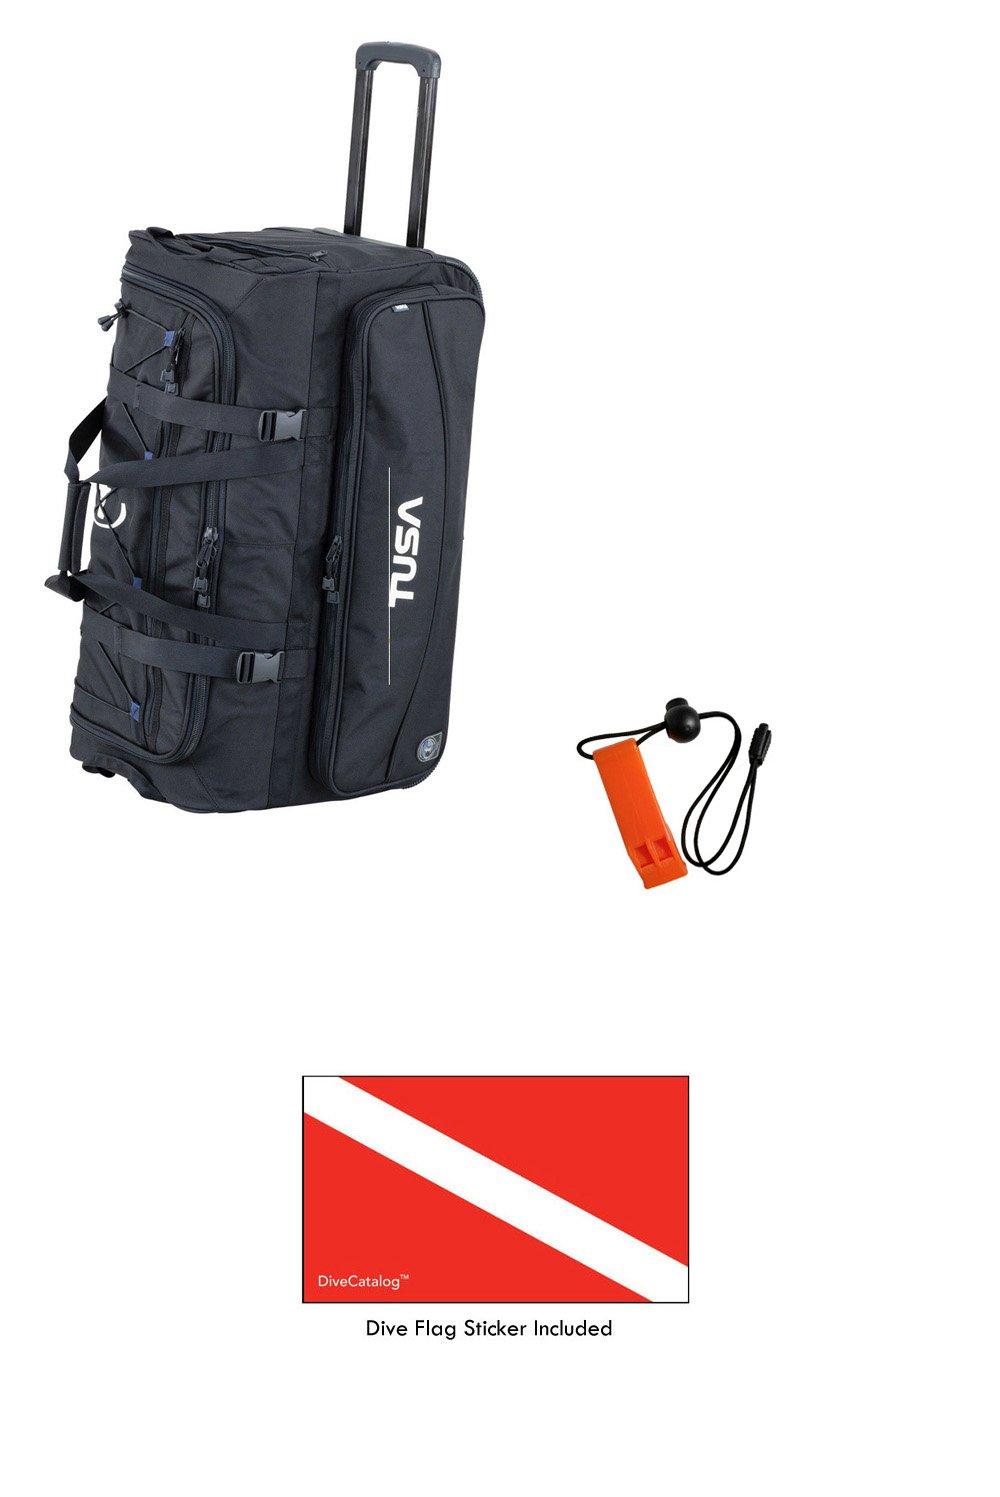 TUSA Dive Gear Roller Duffle Bag in Black & DiveCatalog's Orange Whistle w/Lanyard & Dive Flag Sticker